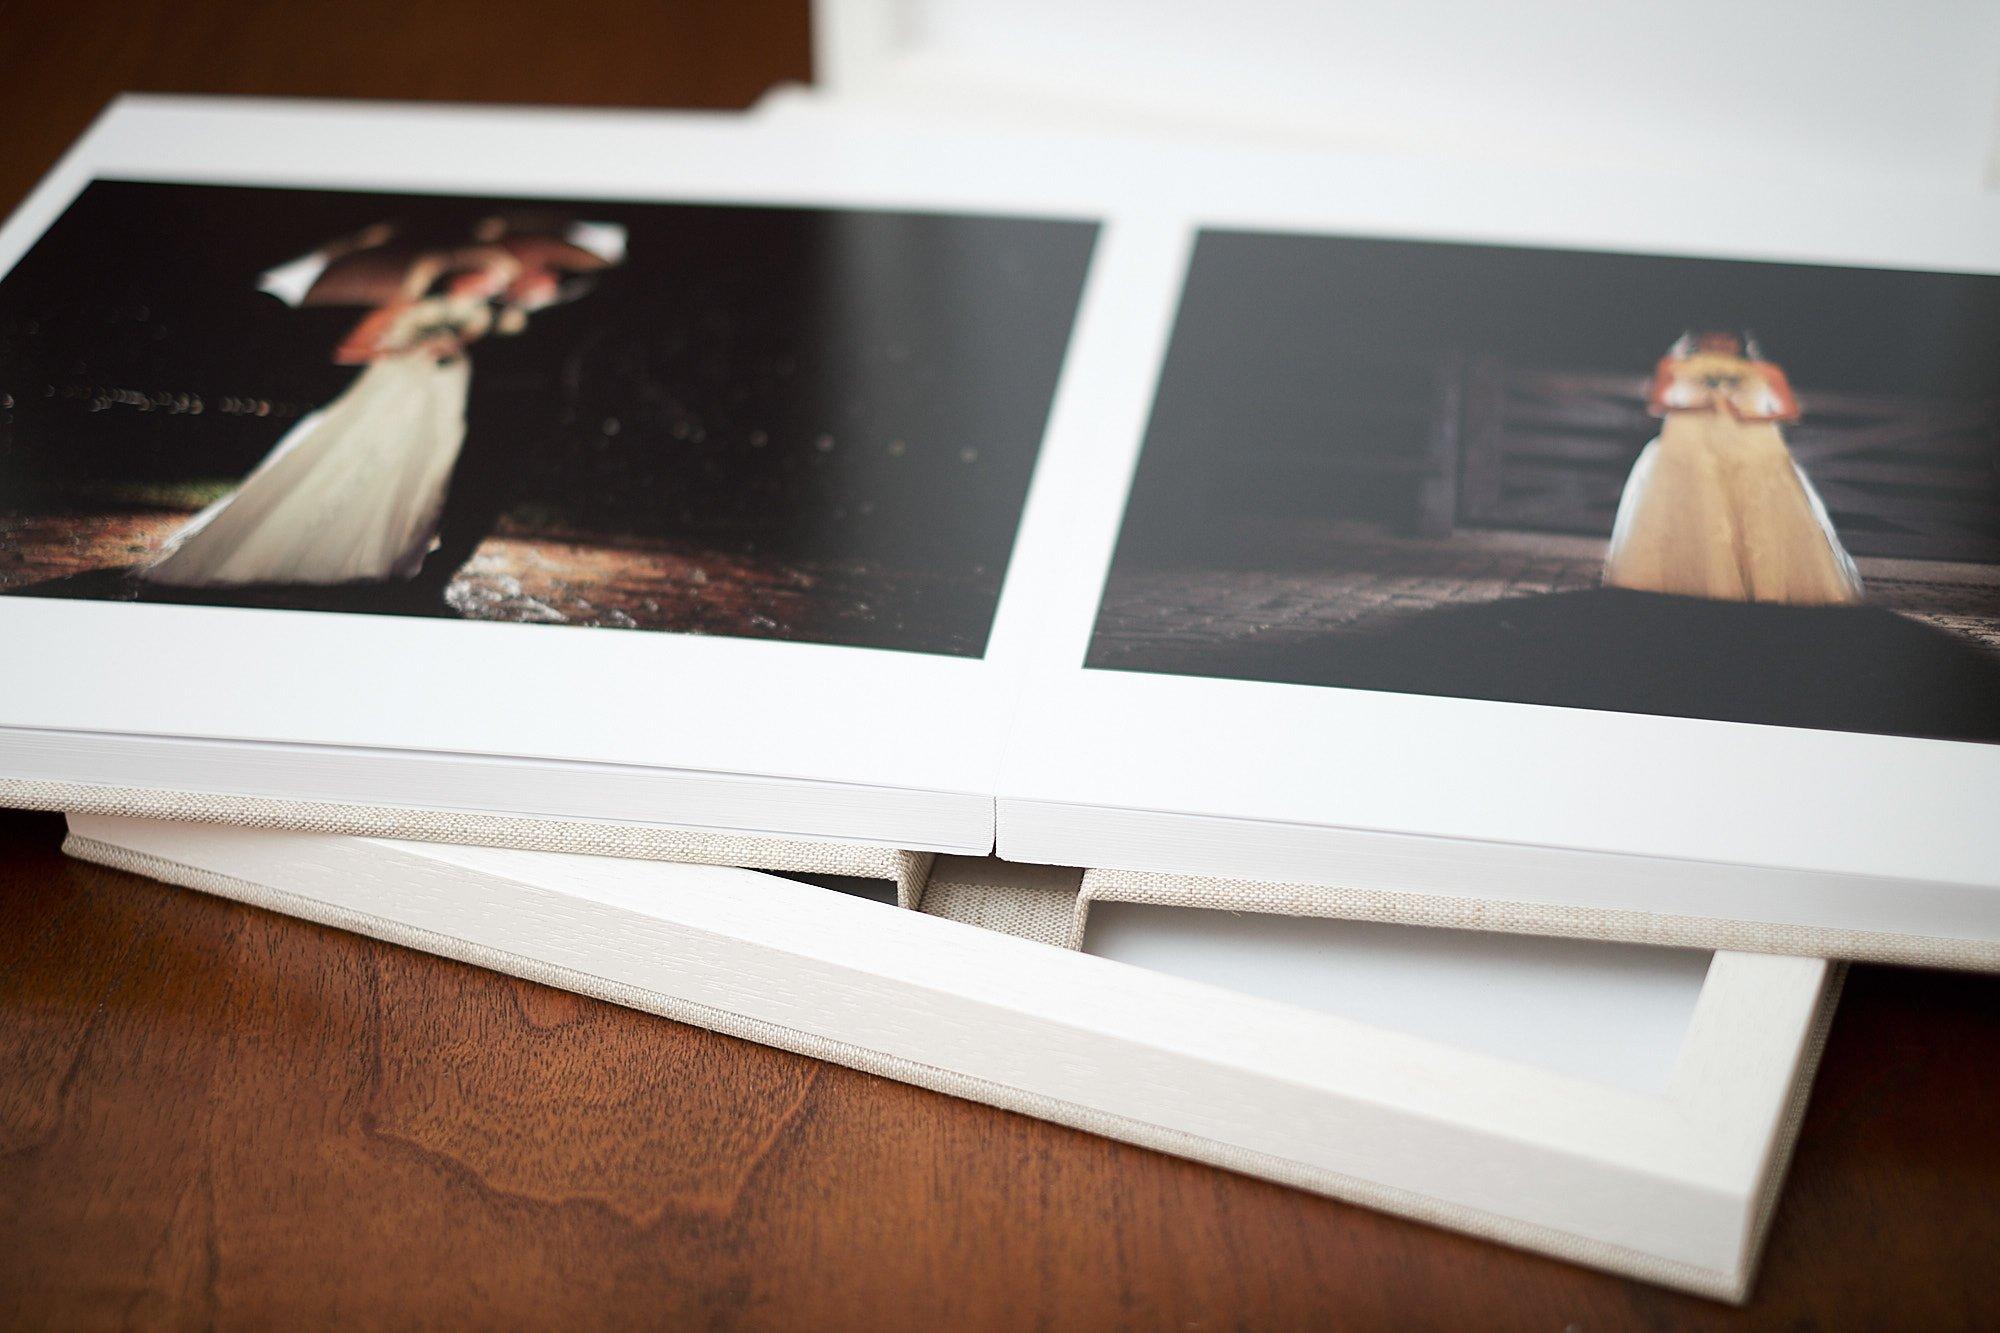 album de boda lino emotivos con historias en fotografias